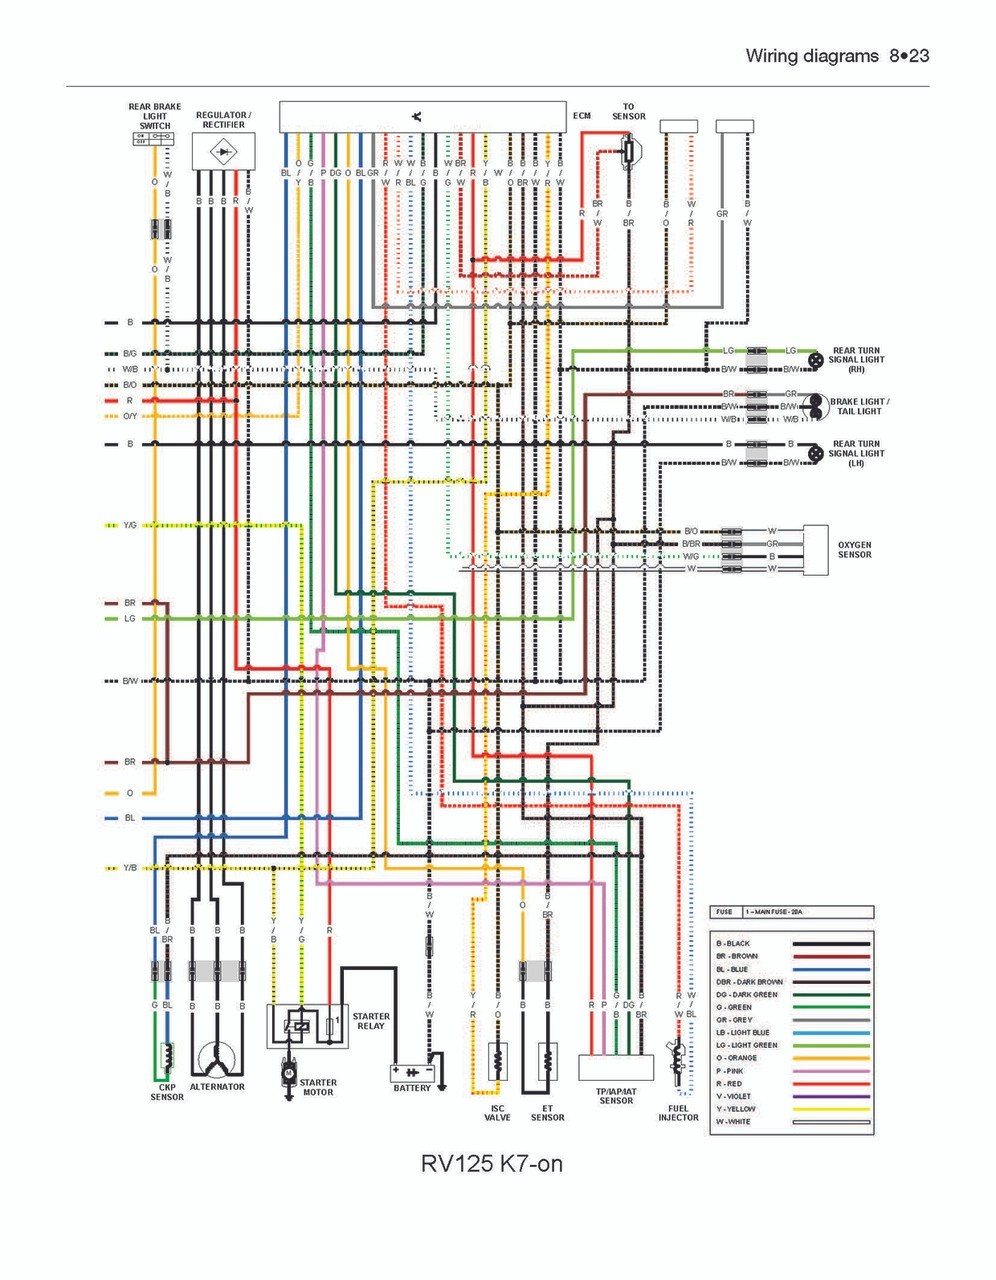 small resolution of suzuki rv125 electrical diagram product wiring diagrams u2022 1973 suzuki rover suzuki rv90 wiring diagram